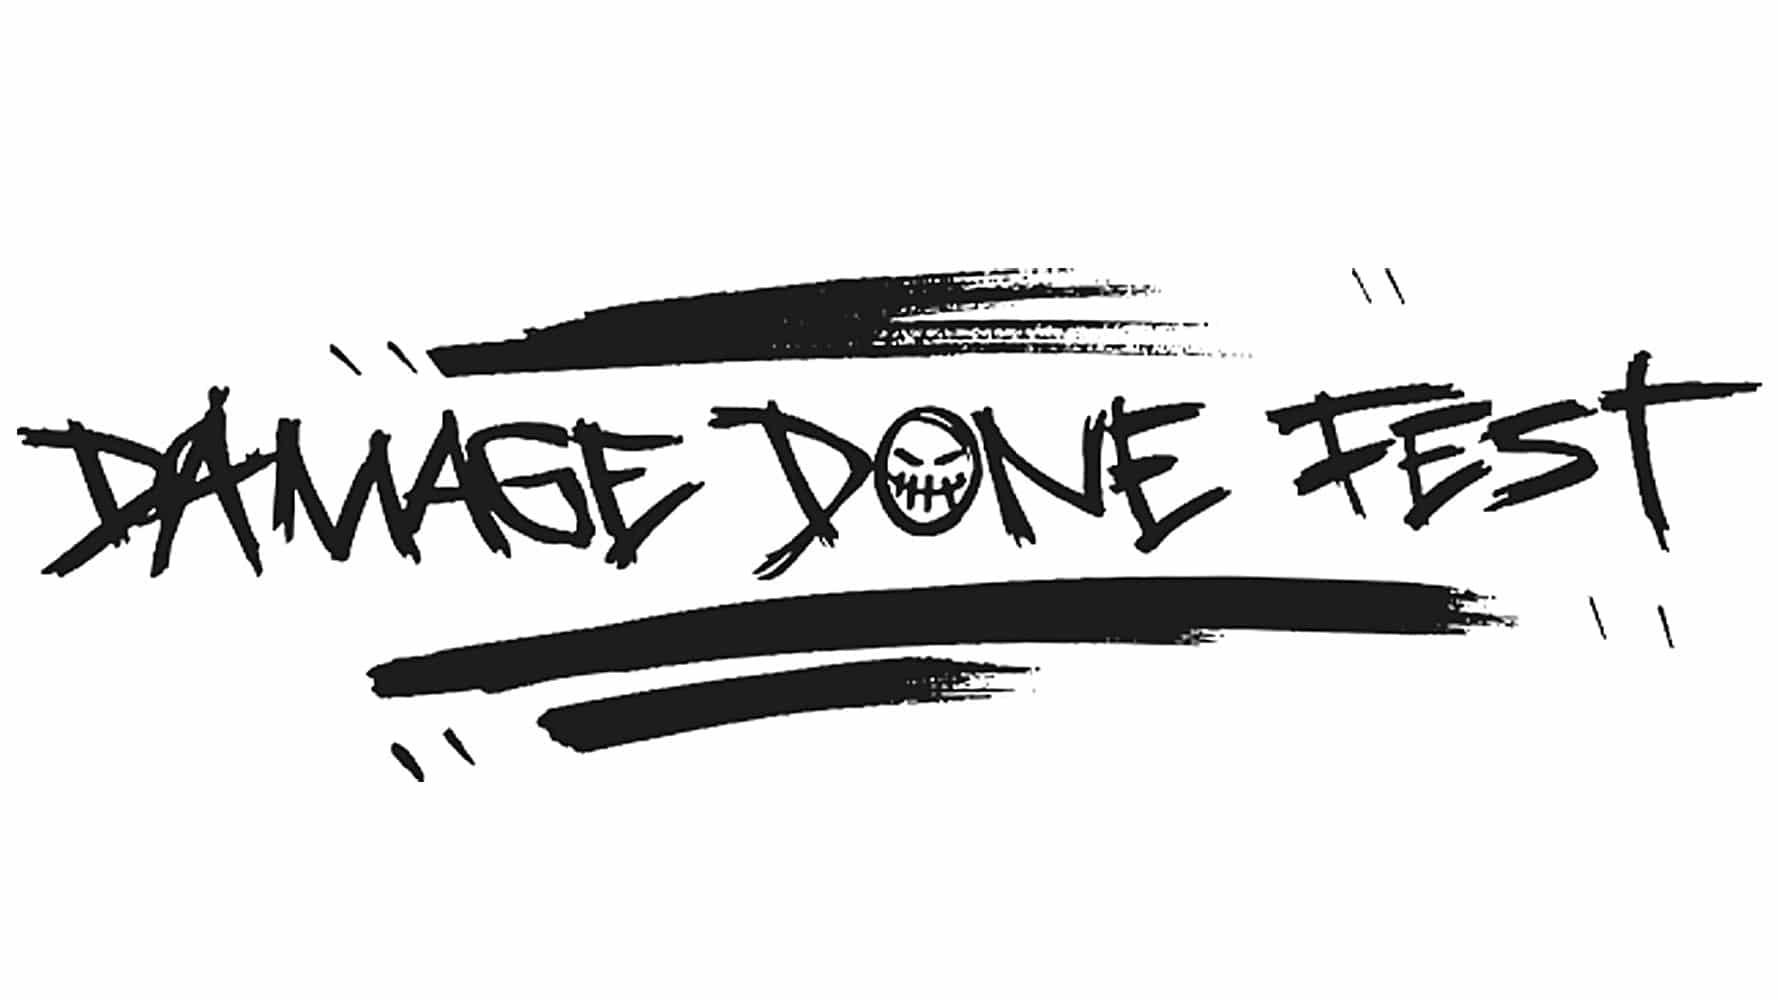 Damage Done Fest 2022